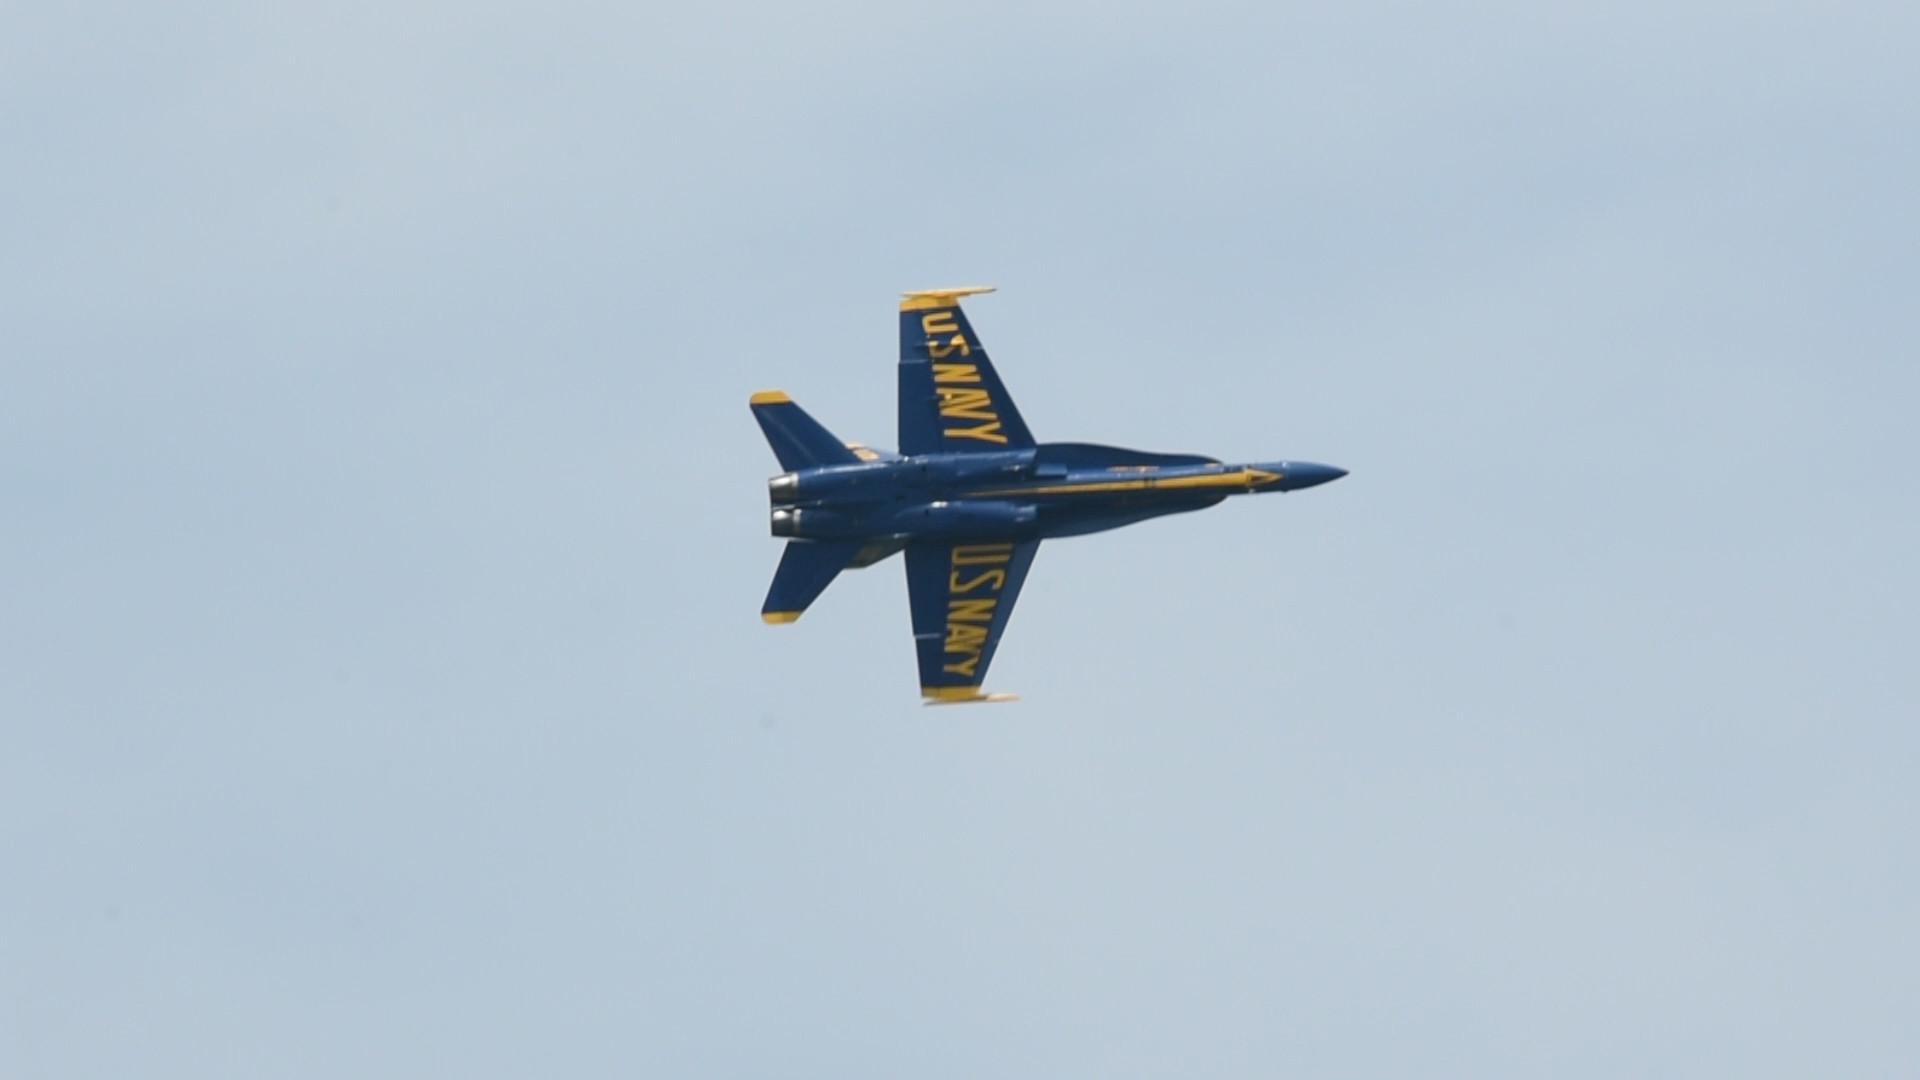 blue angels perform flight demonstration for commissioning